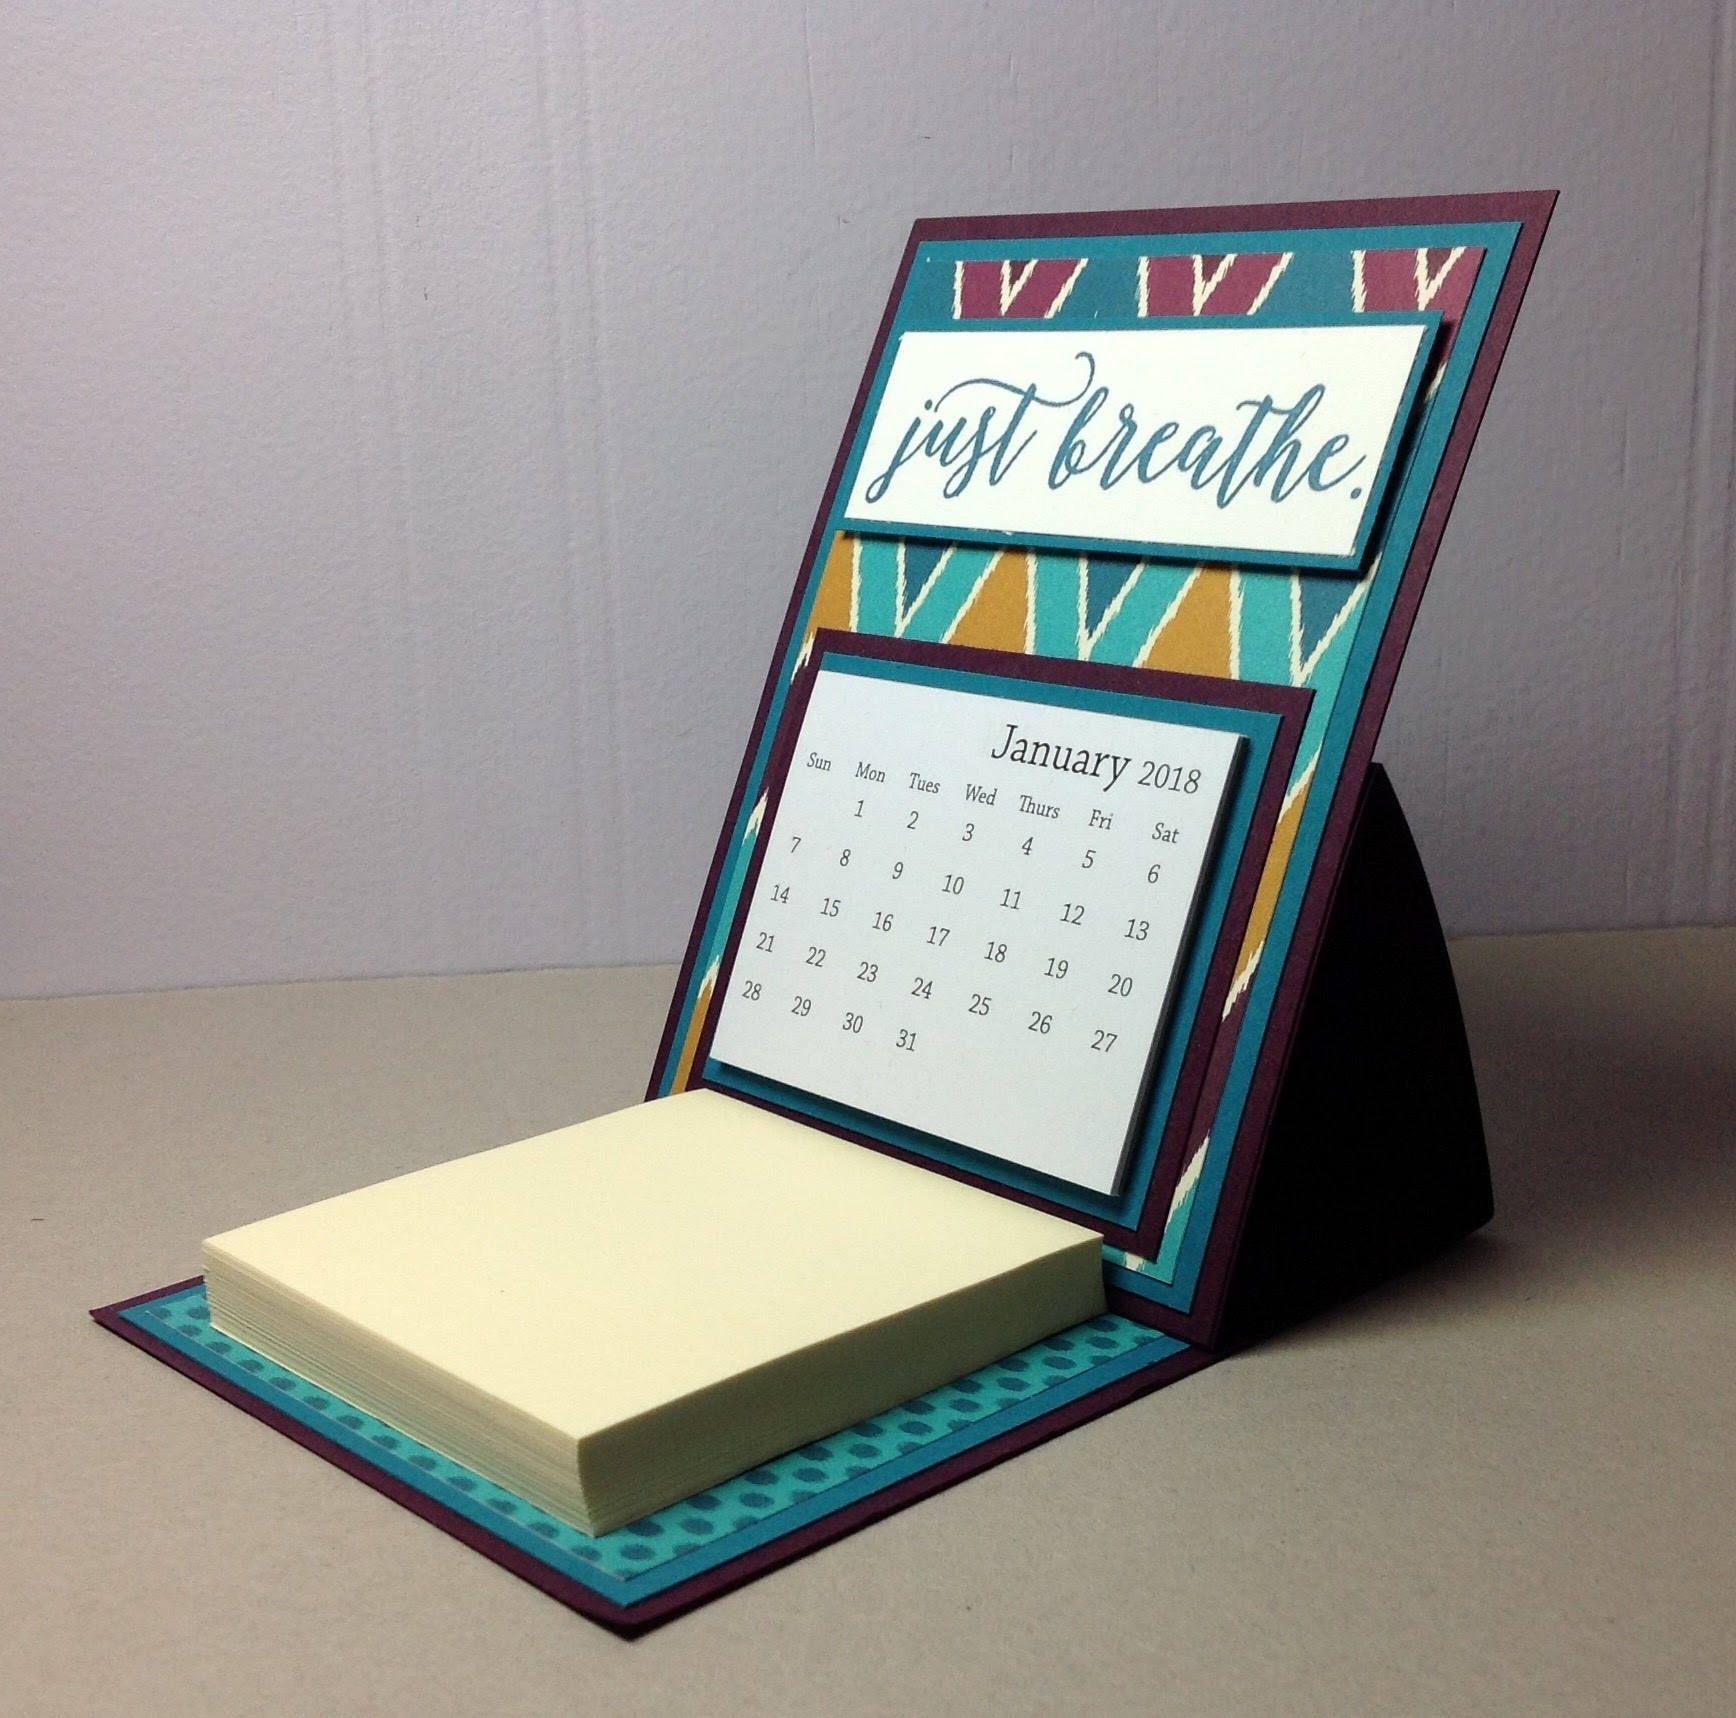 Easel Desk Calendar 2018   Just Breathe Calendar   Coworker